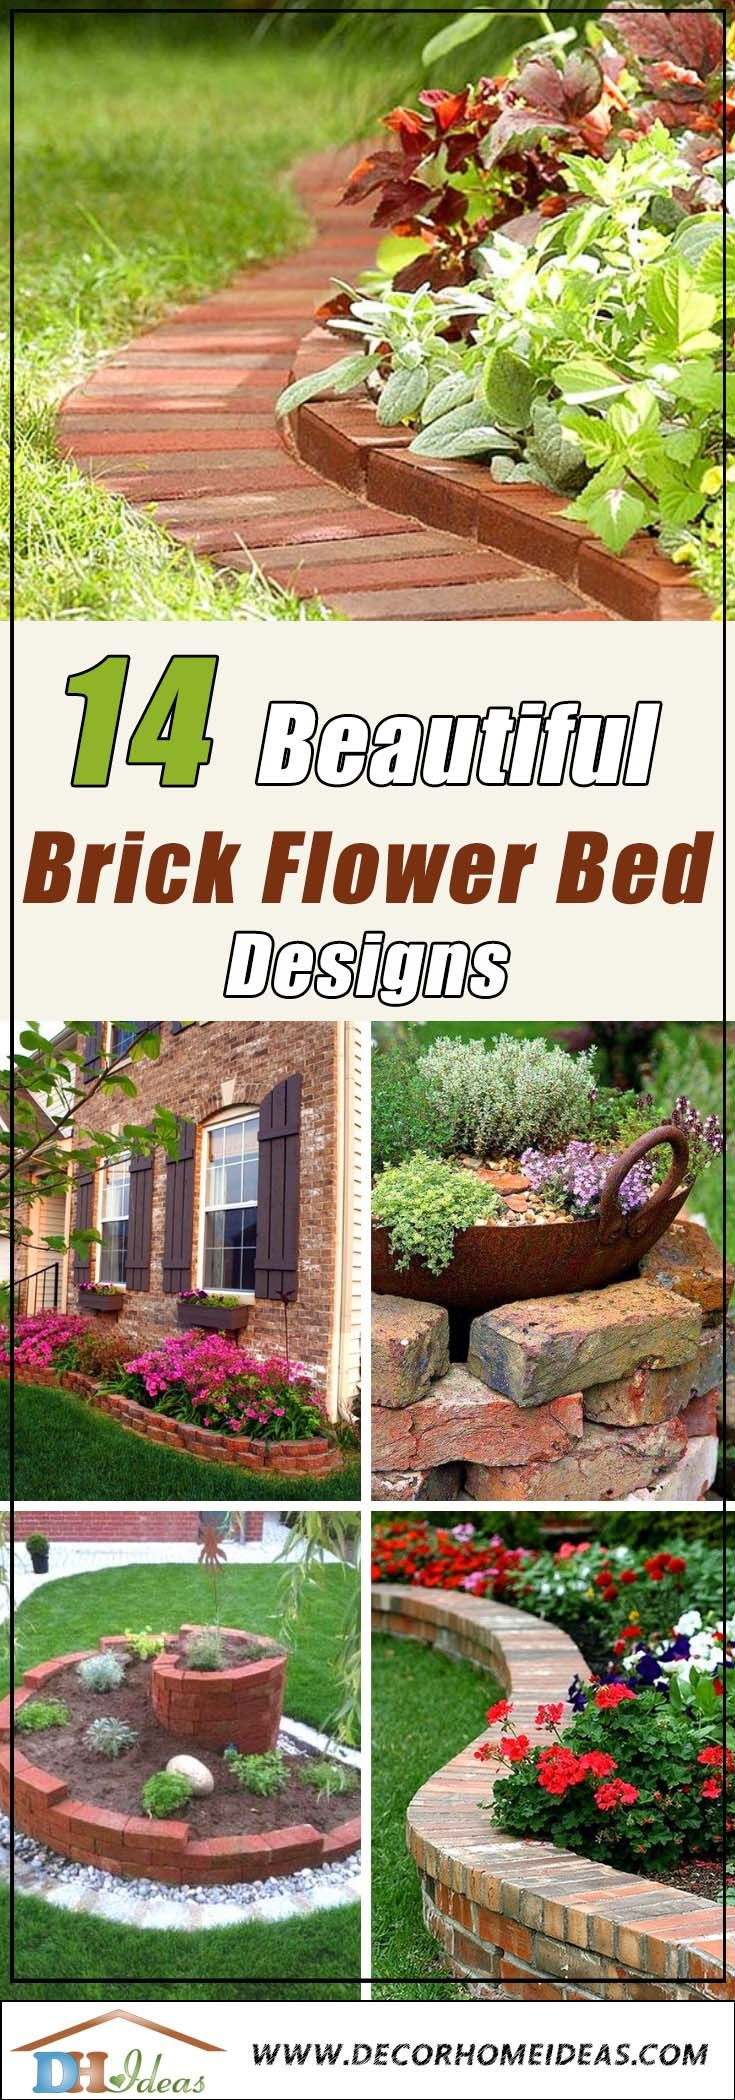 14 Brick Flower Bed Design Ideas You Can Replicate 400 x 300